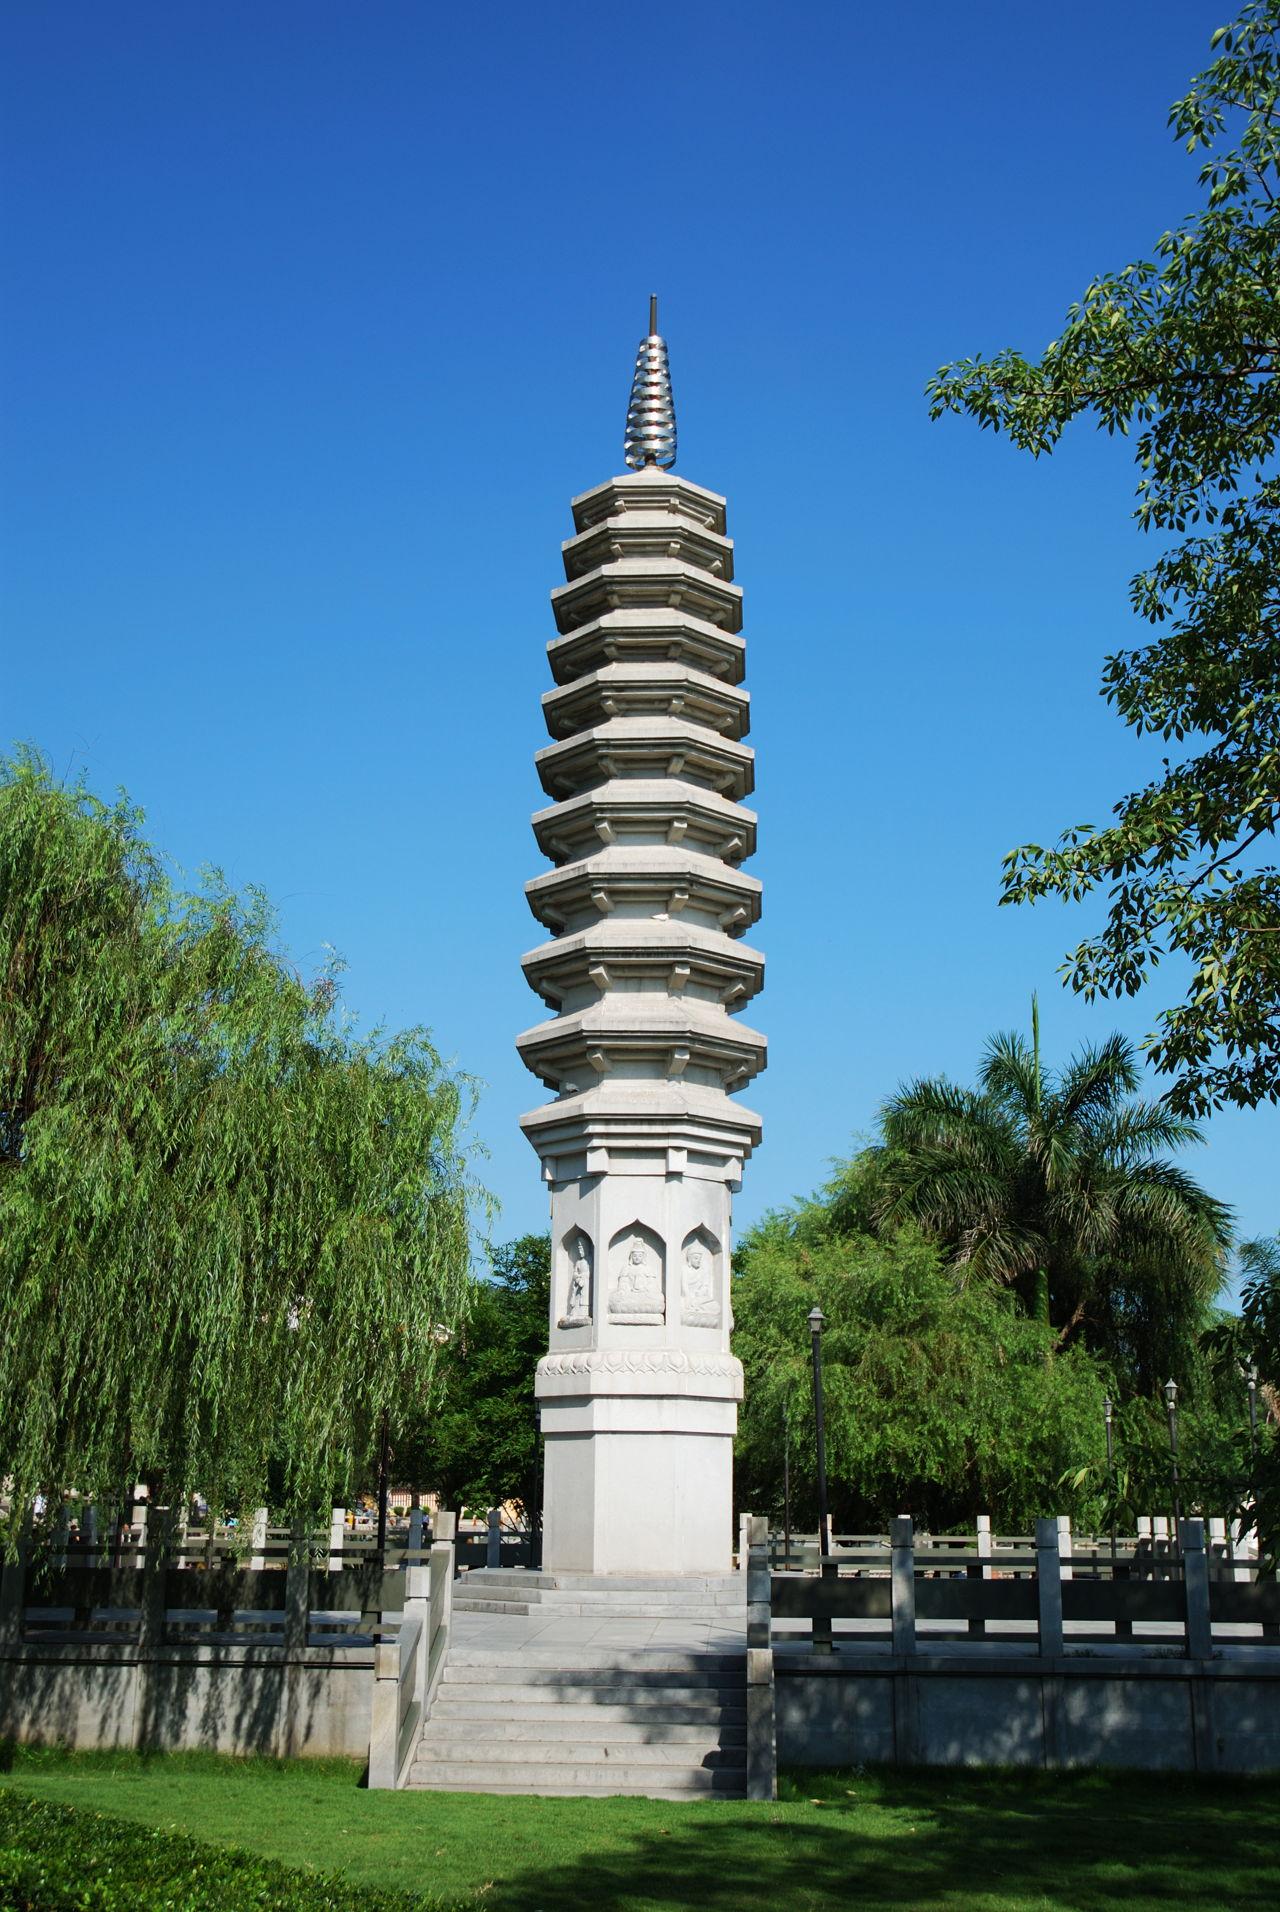 chinese ancient traditional customs tower buddha china